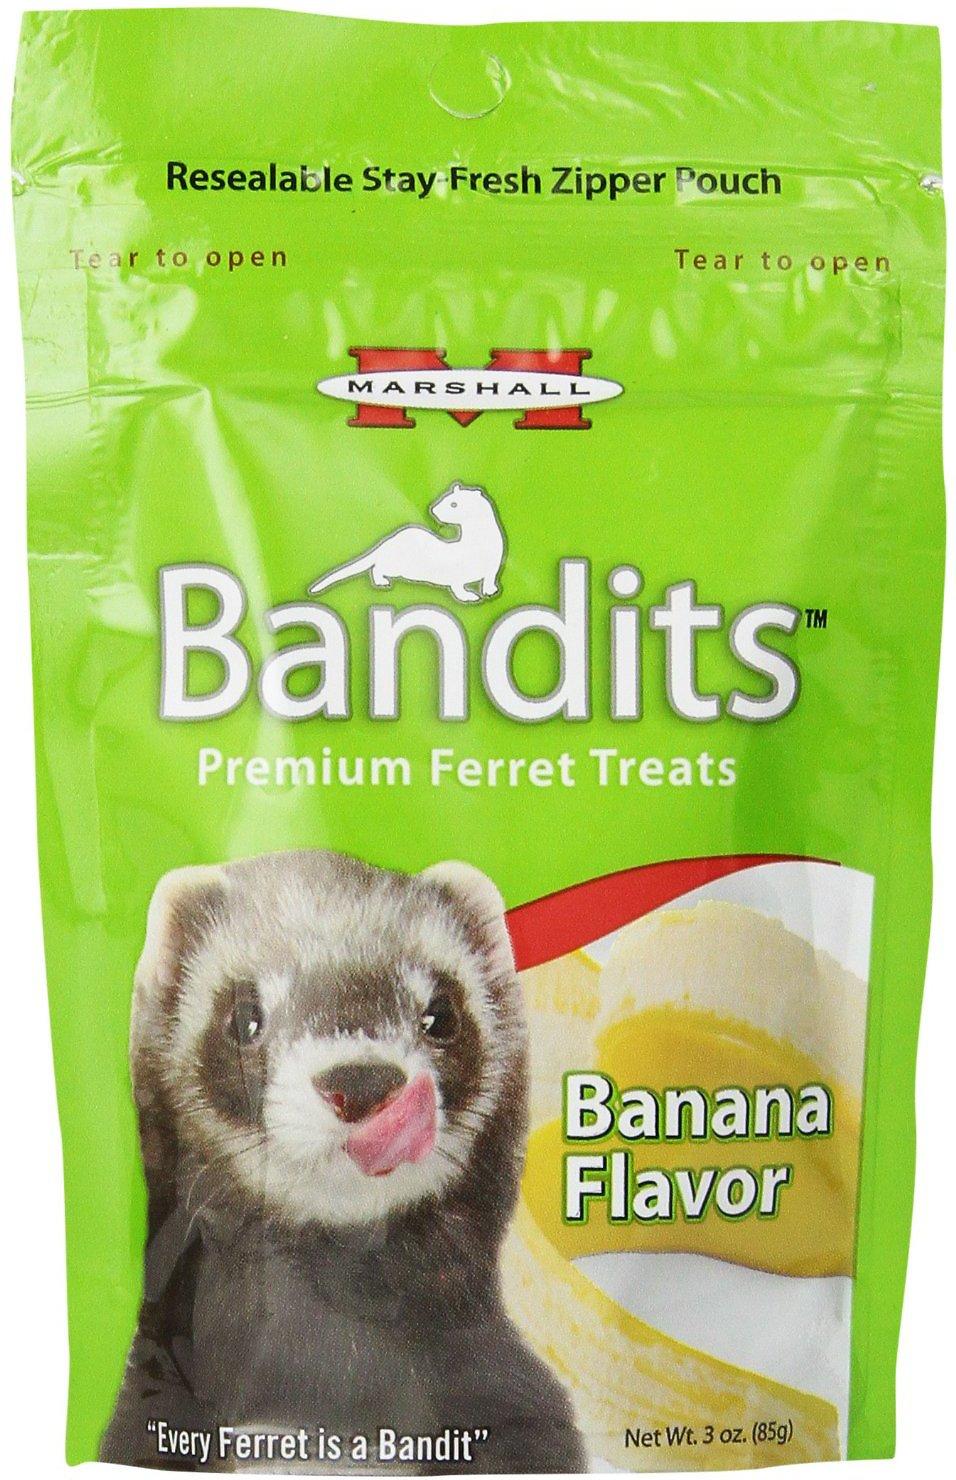 Marshall Bandits Premium Banana Flavor Ferret Treats, 3-oz bag Image